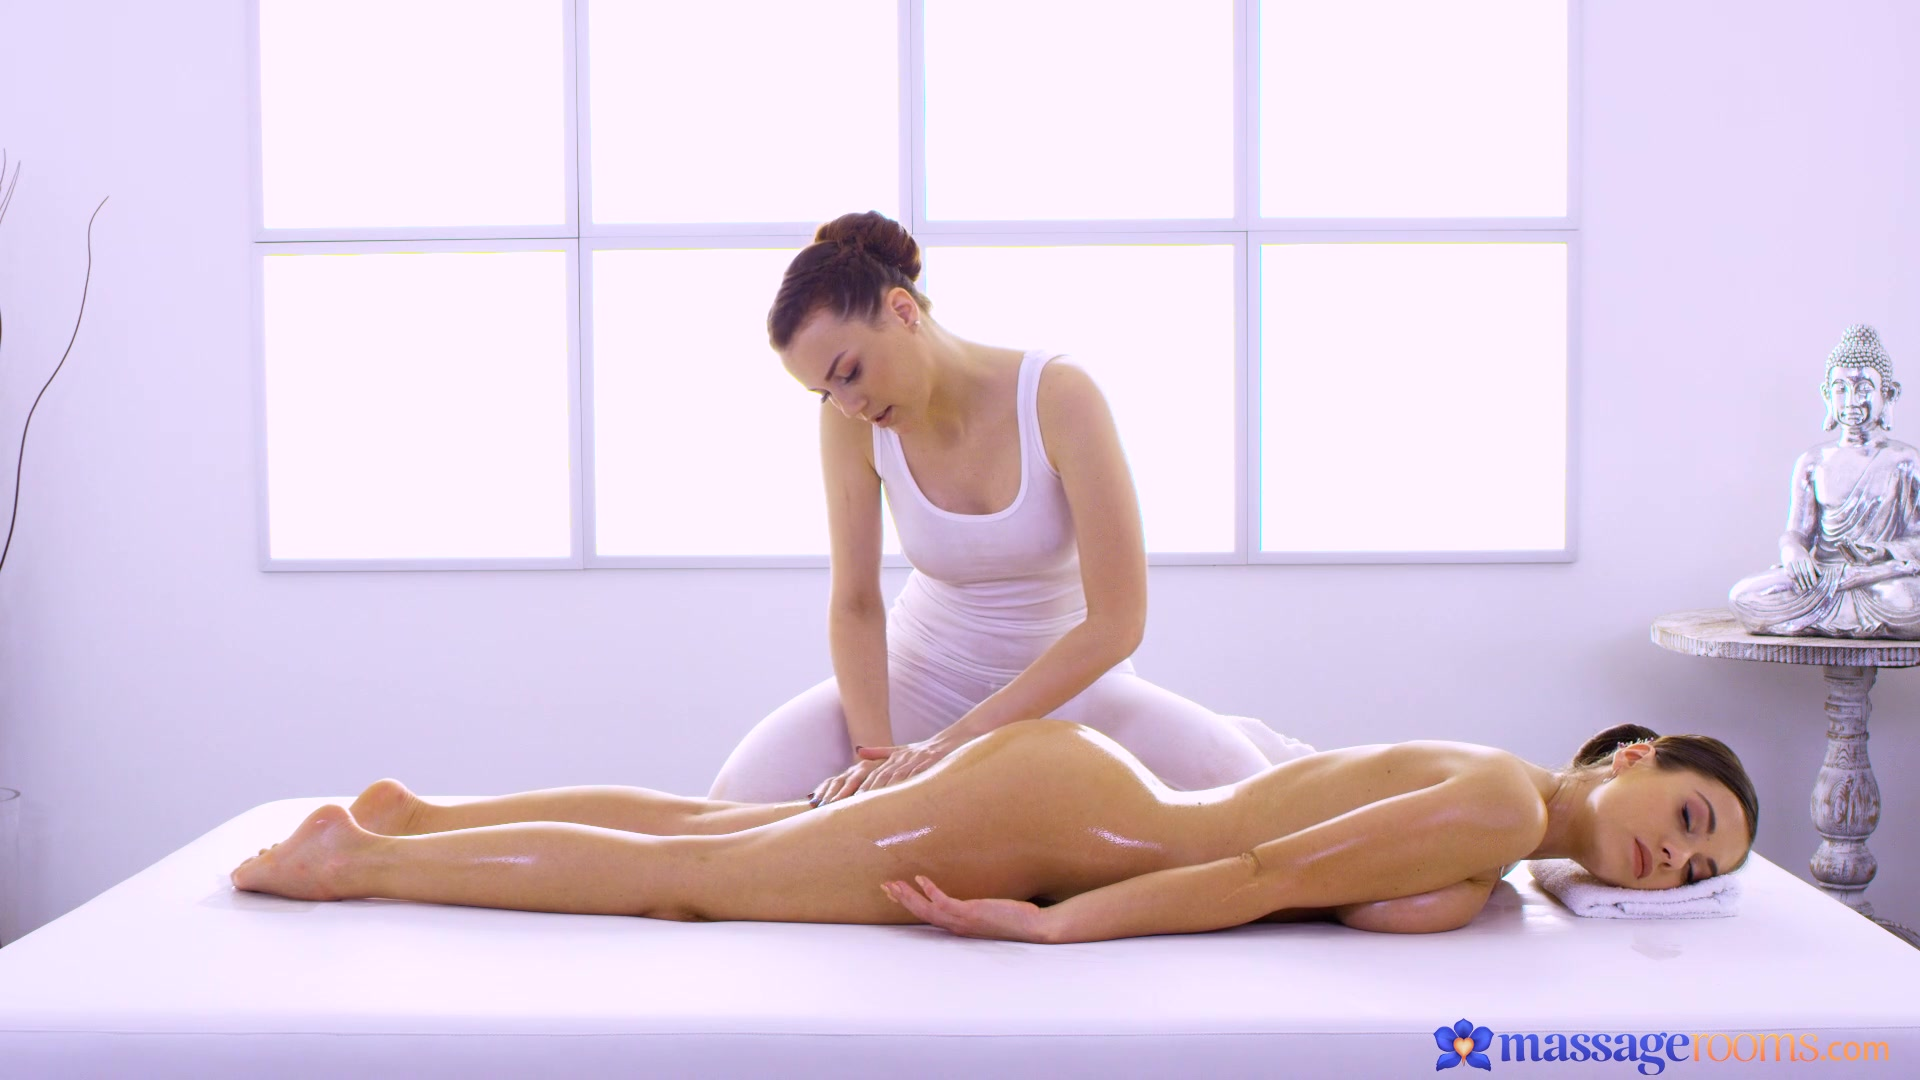 Massage Ladies